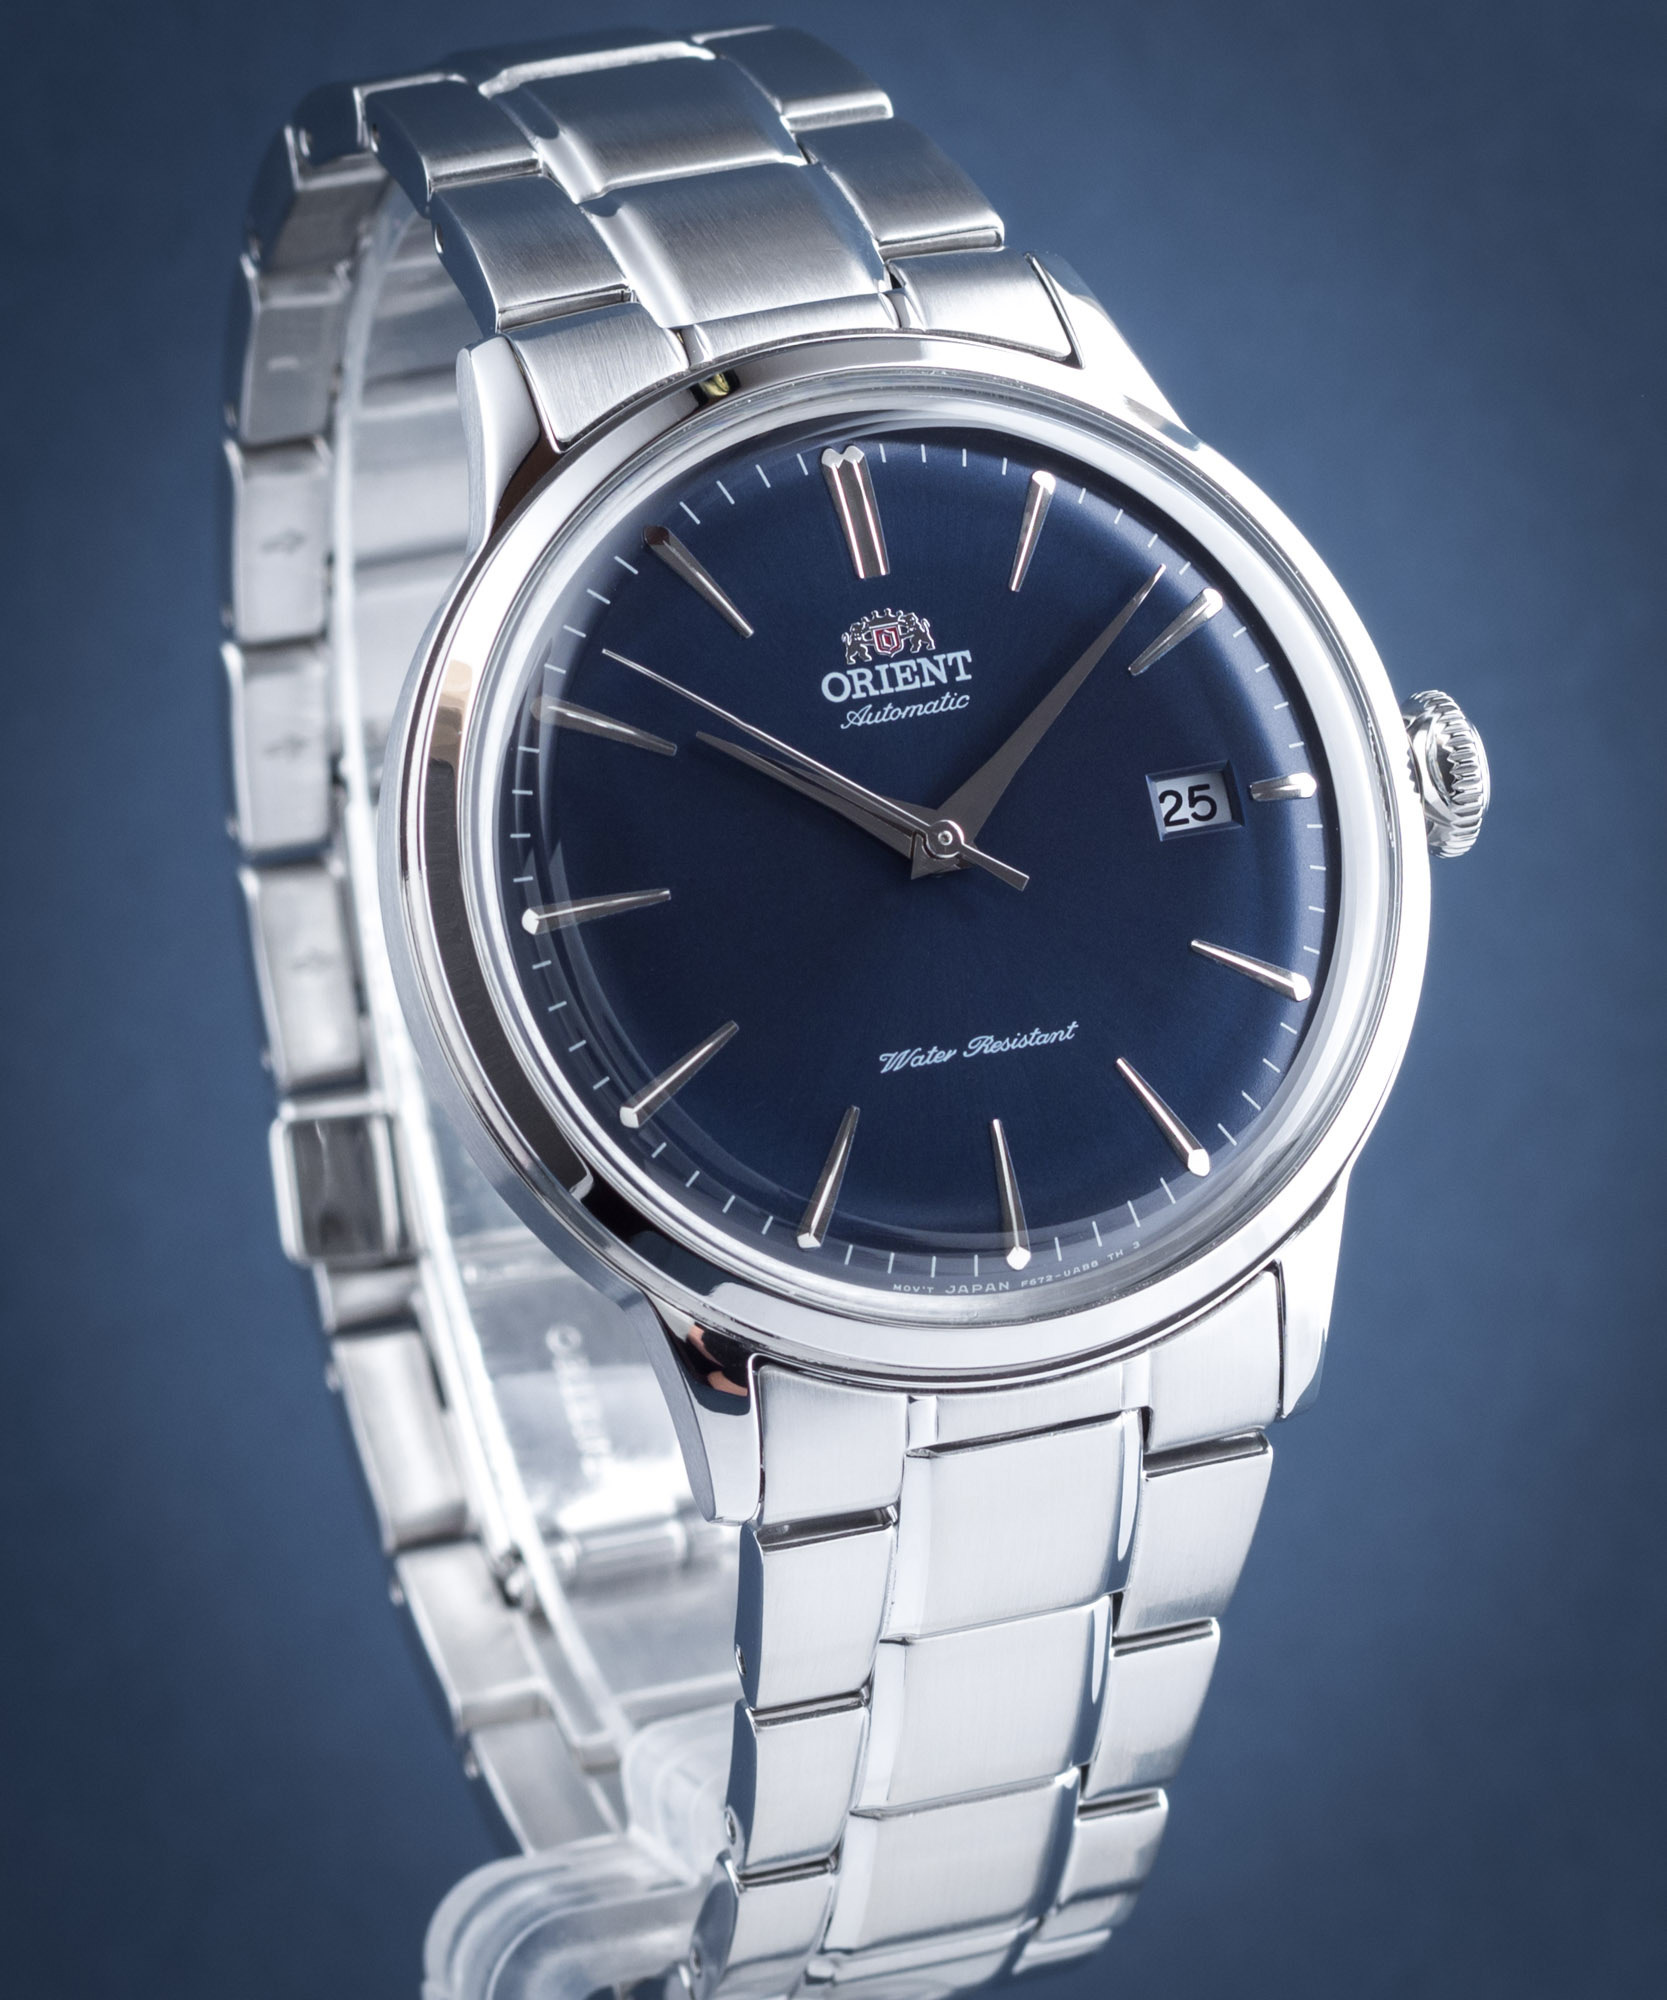 Zegarek męski Orient Classic Bambino II Automatic